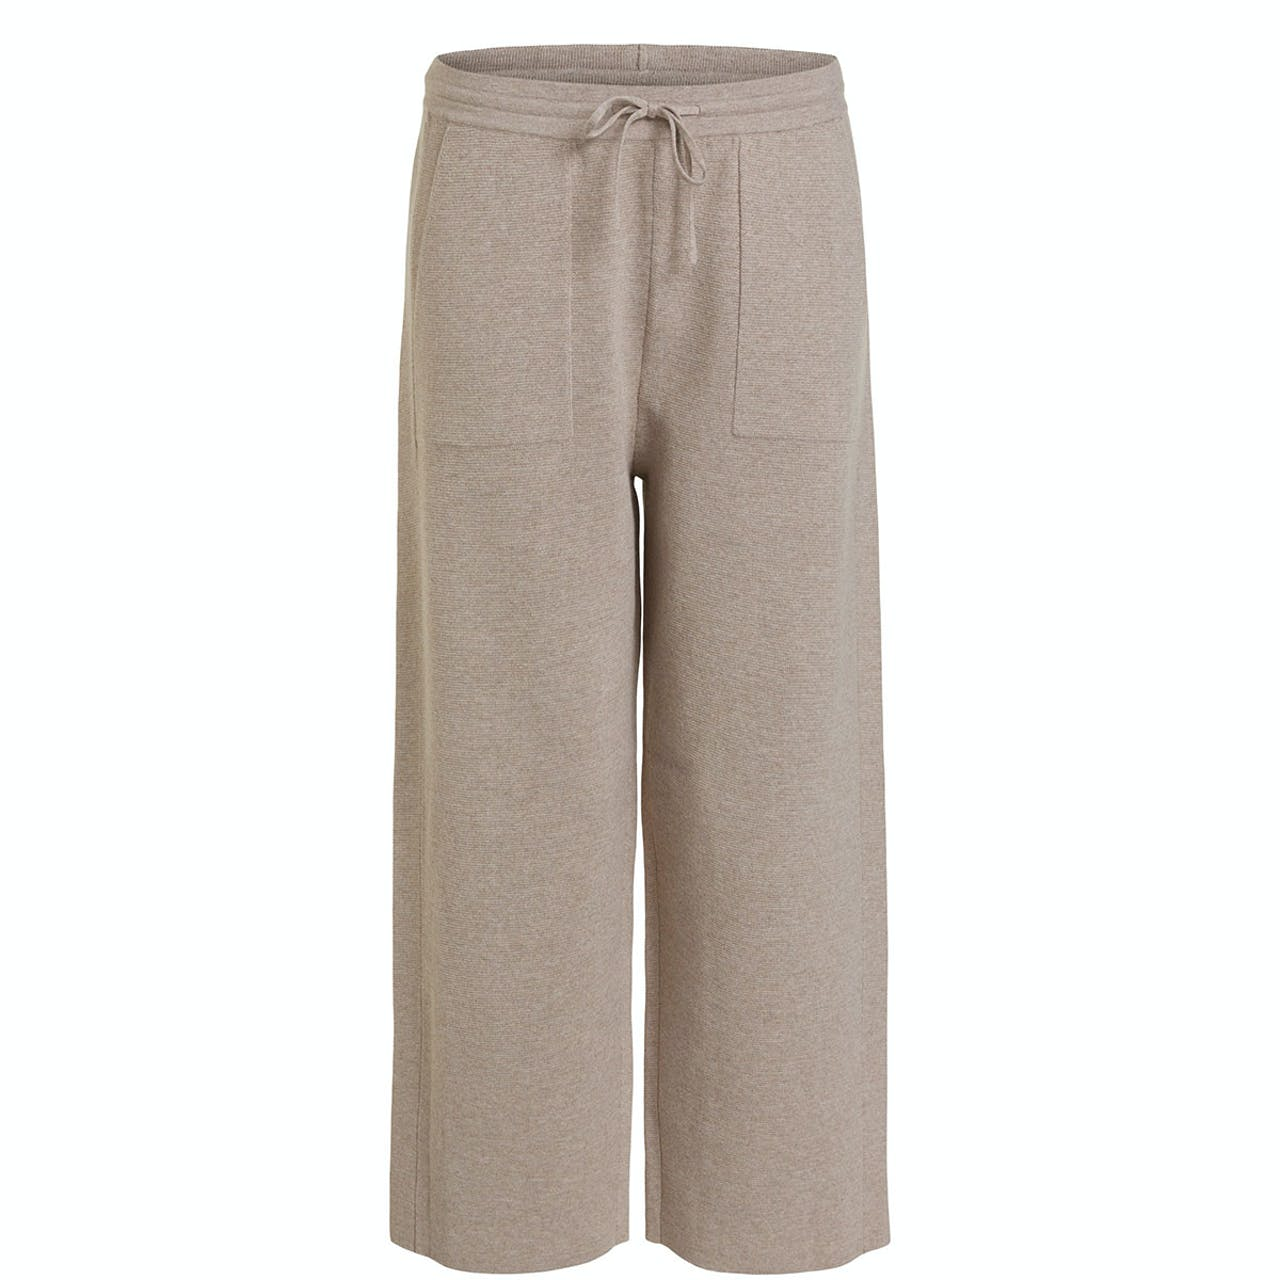 Oui Wide Leg Leisure Trousers Stone